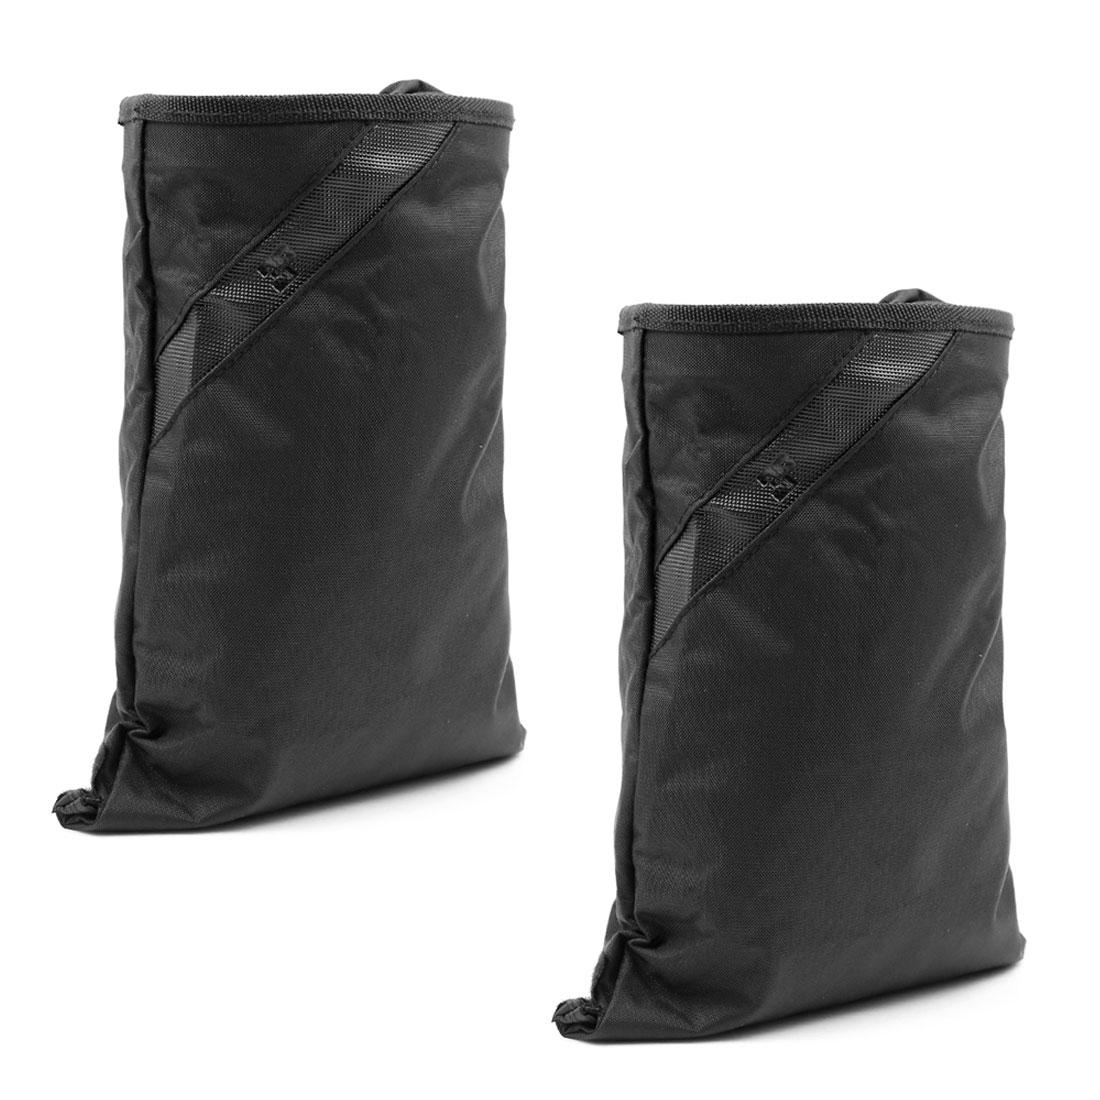 2 Pcs Black Nylon Detachable Closure Garbage Trash Bag Organizer w Suction Cup